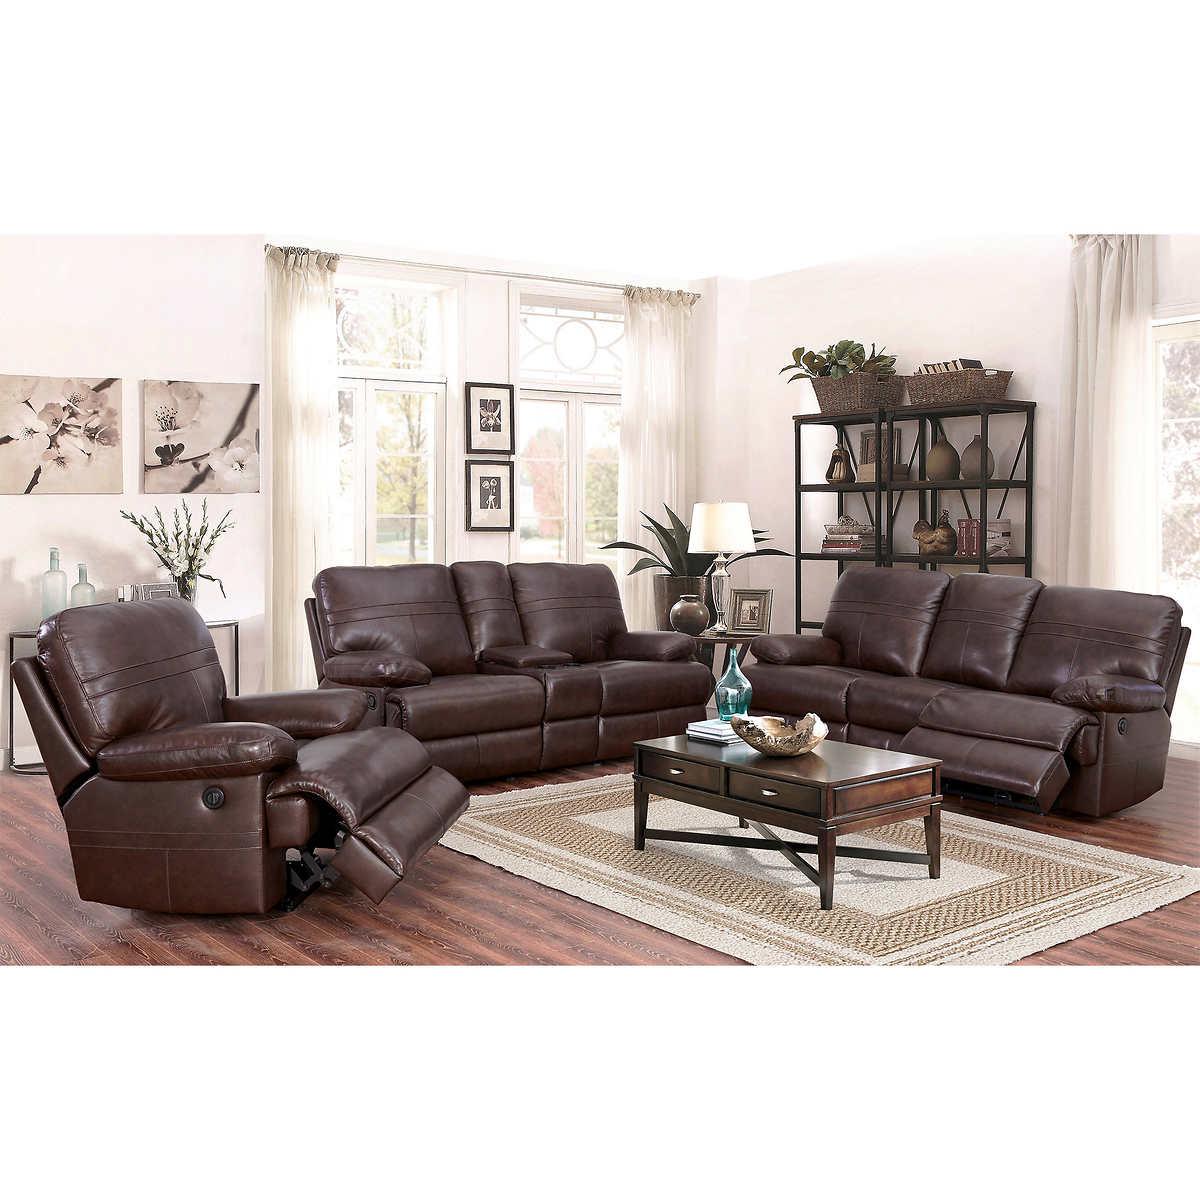 Costco Living Room Sets: Living Room Sets Under 800